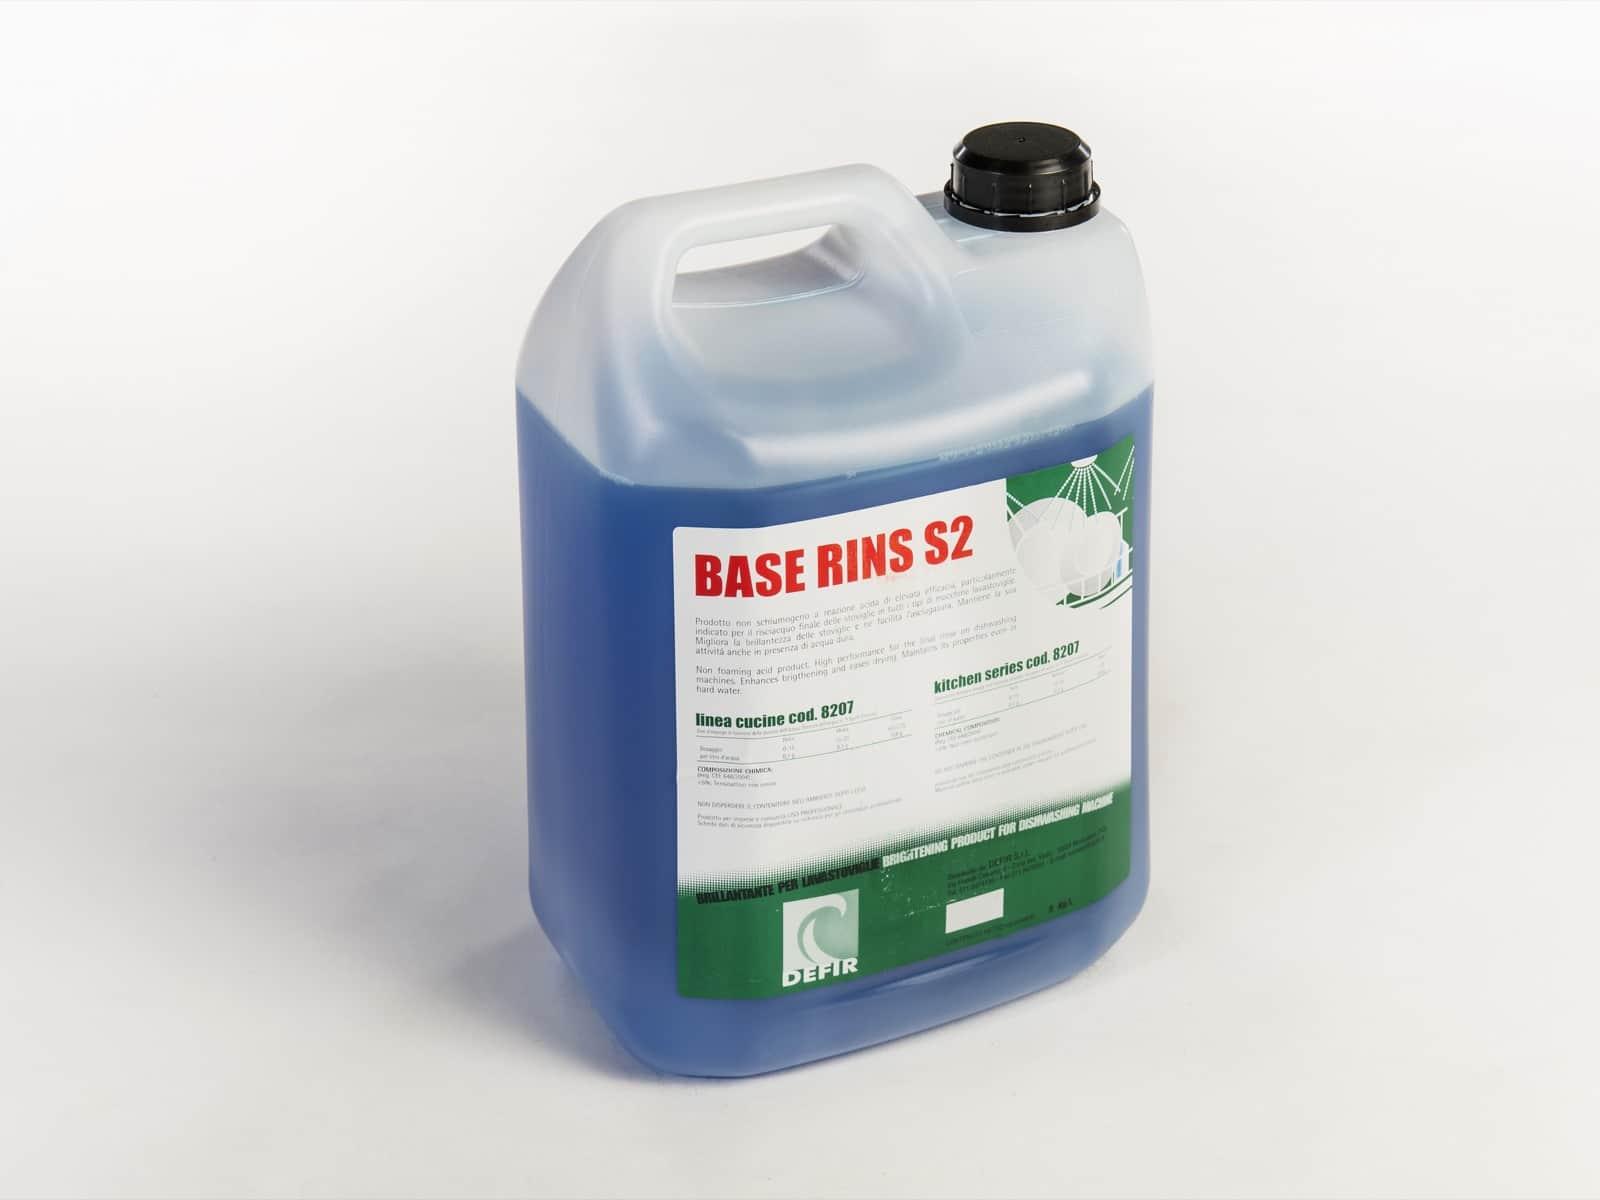 Base Rins S2 cucine 5L - Defir detergenti Moncalieri Torino